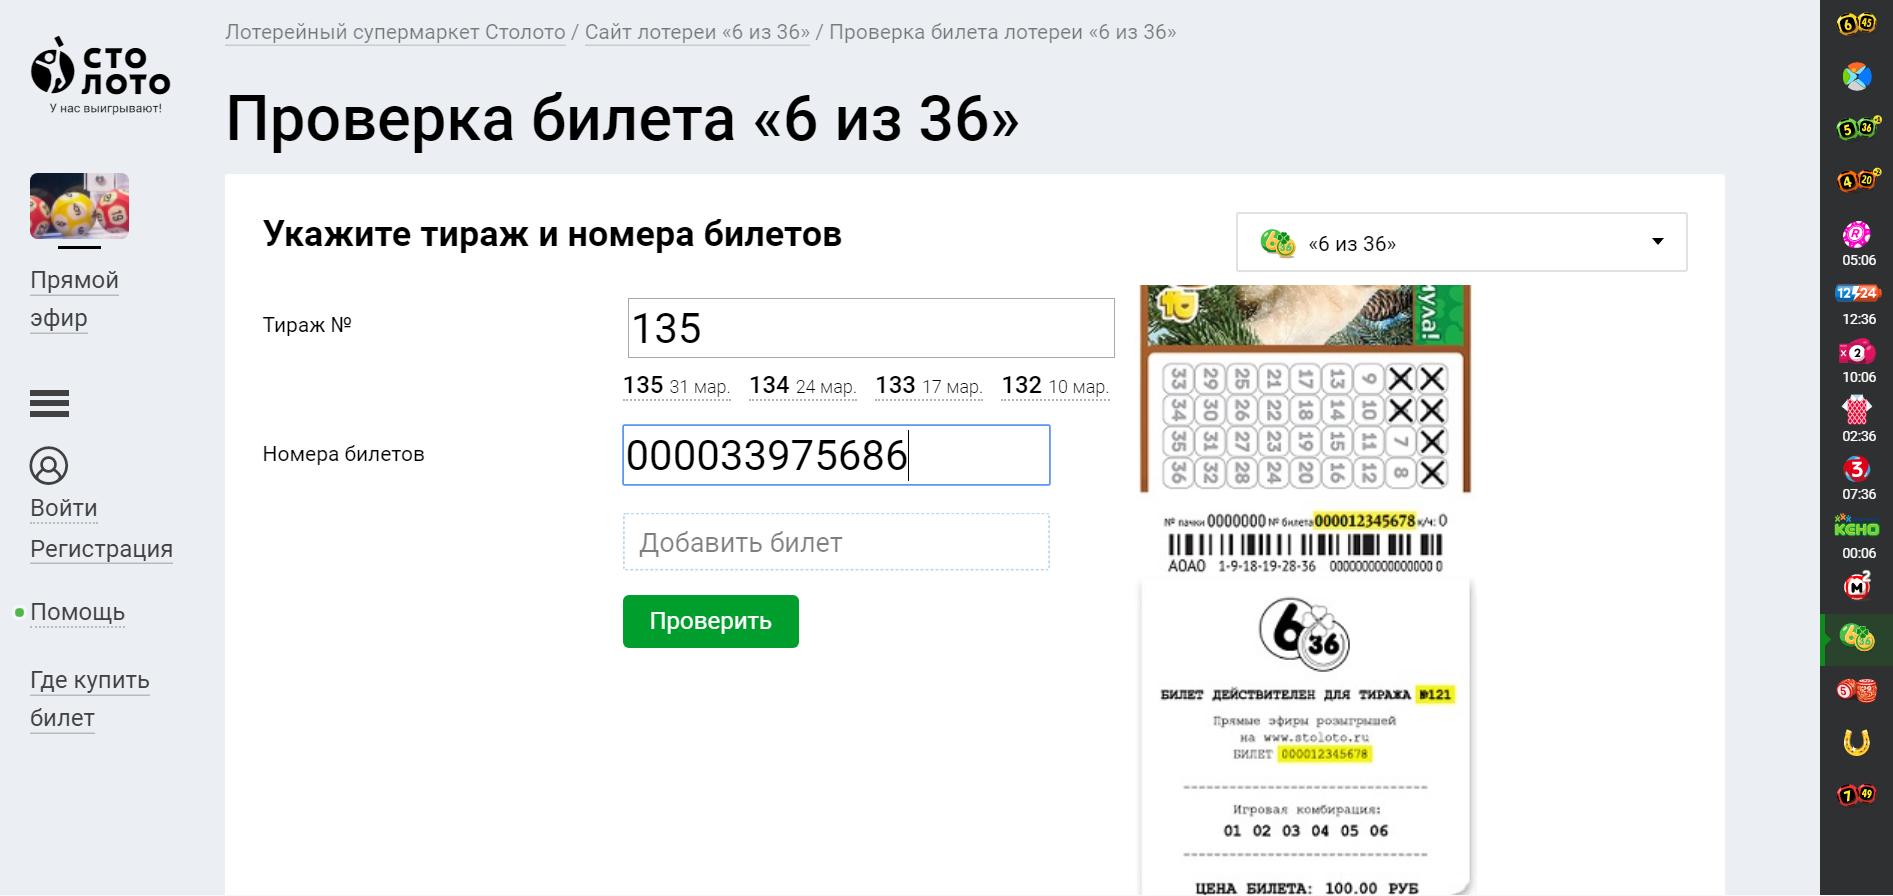 Проверить билет лото: по тиражу, по номеру билета столото, на сайте